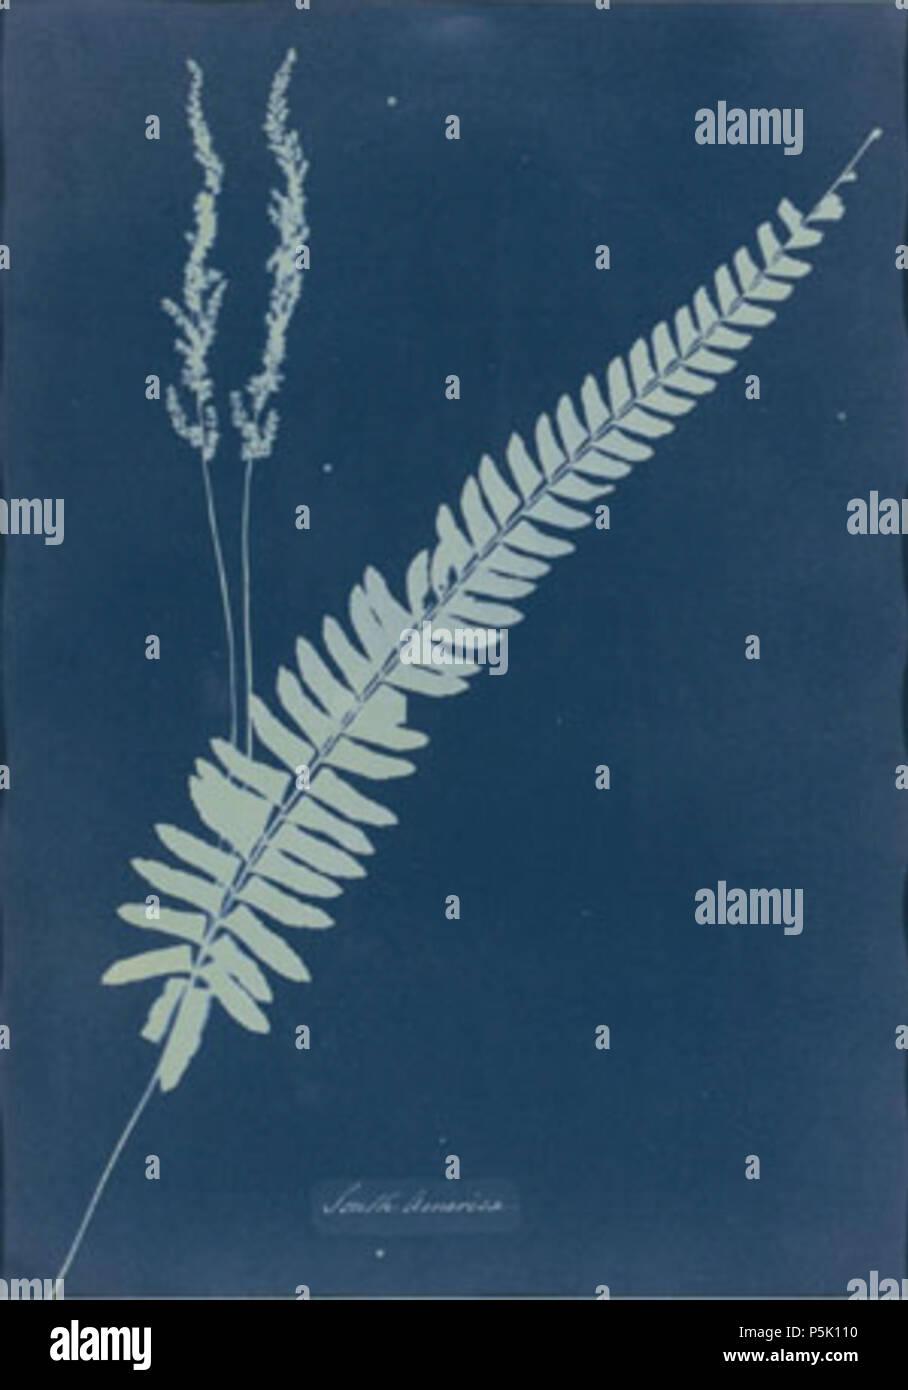 Na south america cyanotype photogram of a fern specimen circa na south america cyanotype photogram of a fern specimen circa 1851 54 anna atkins 17991871 alternative names anna children a a anna ne children freerunsca Images